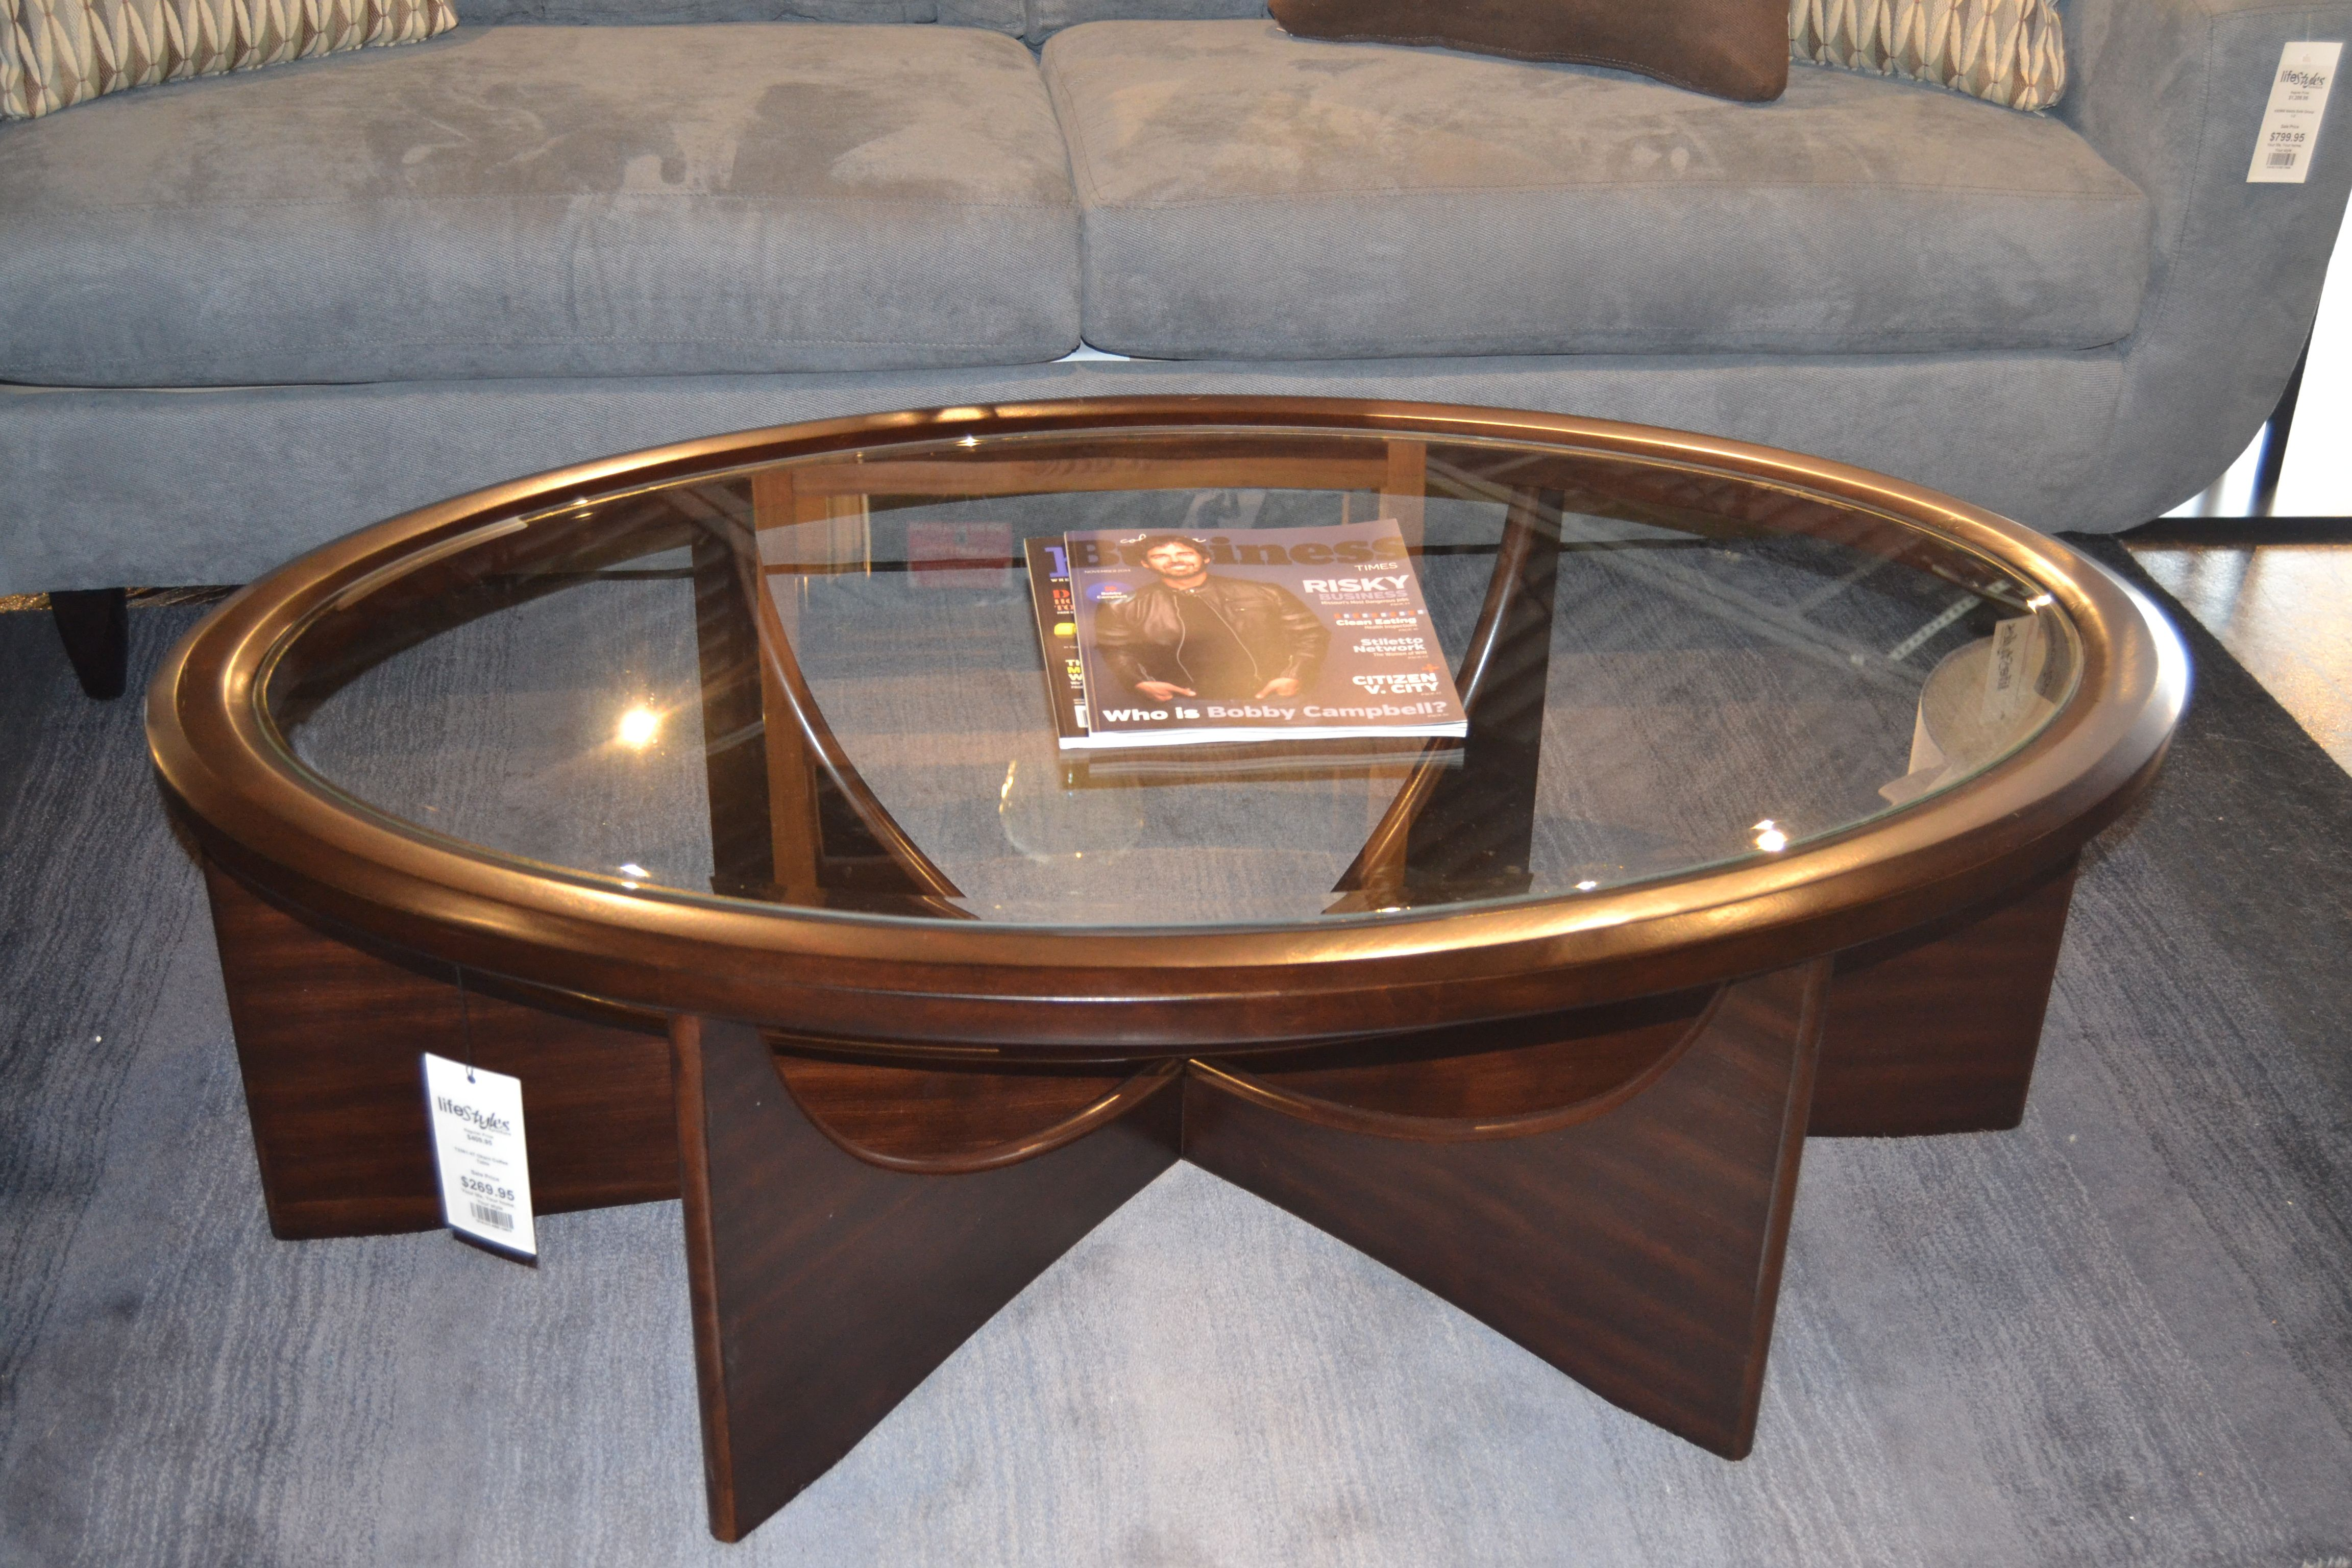 Introducing the Okani Coffee Table! www.lifestylescomo.com